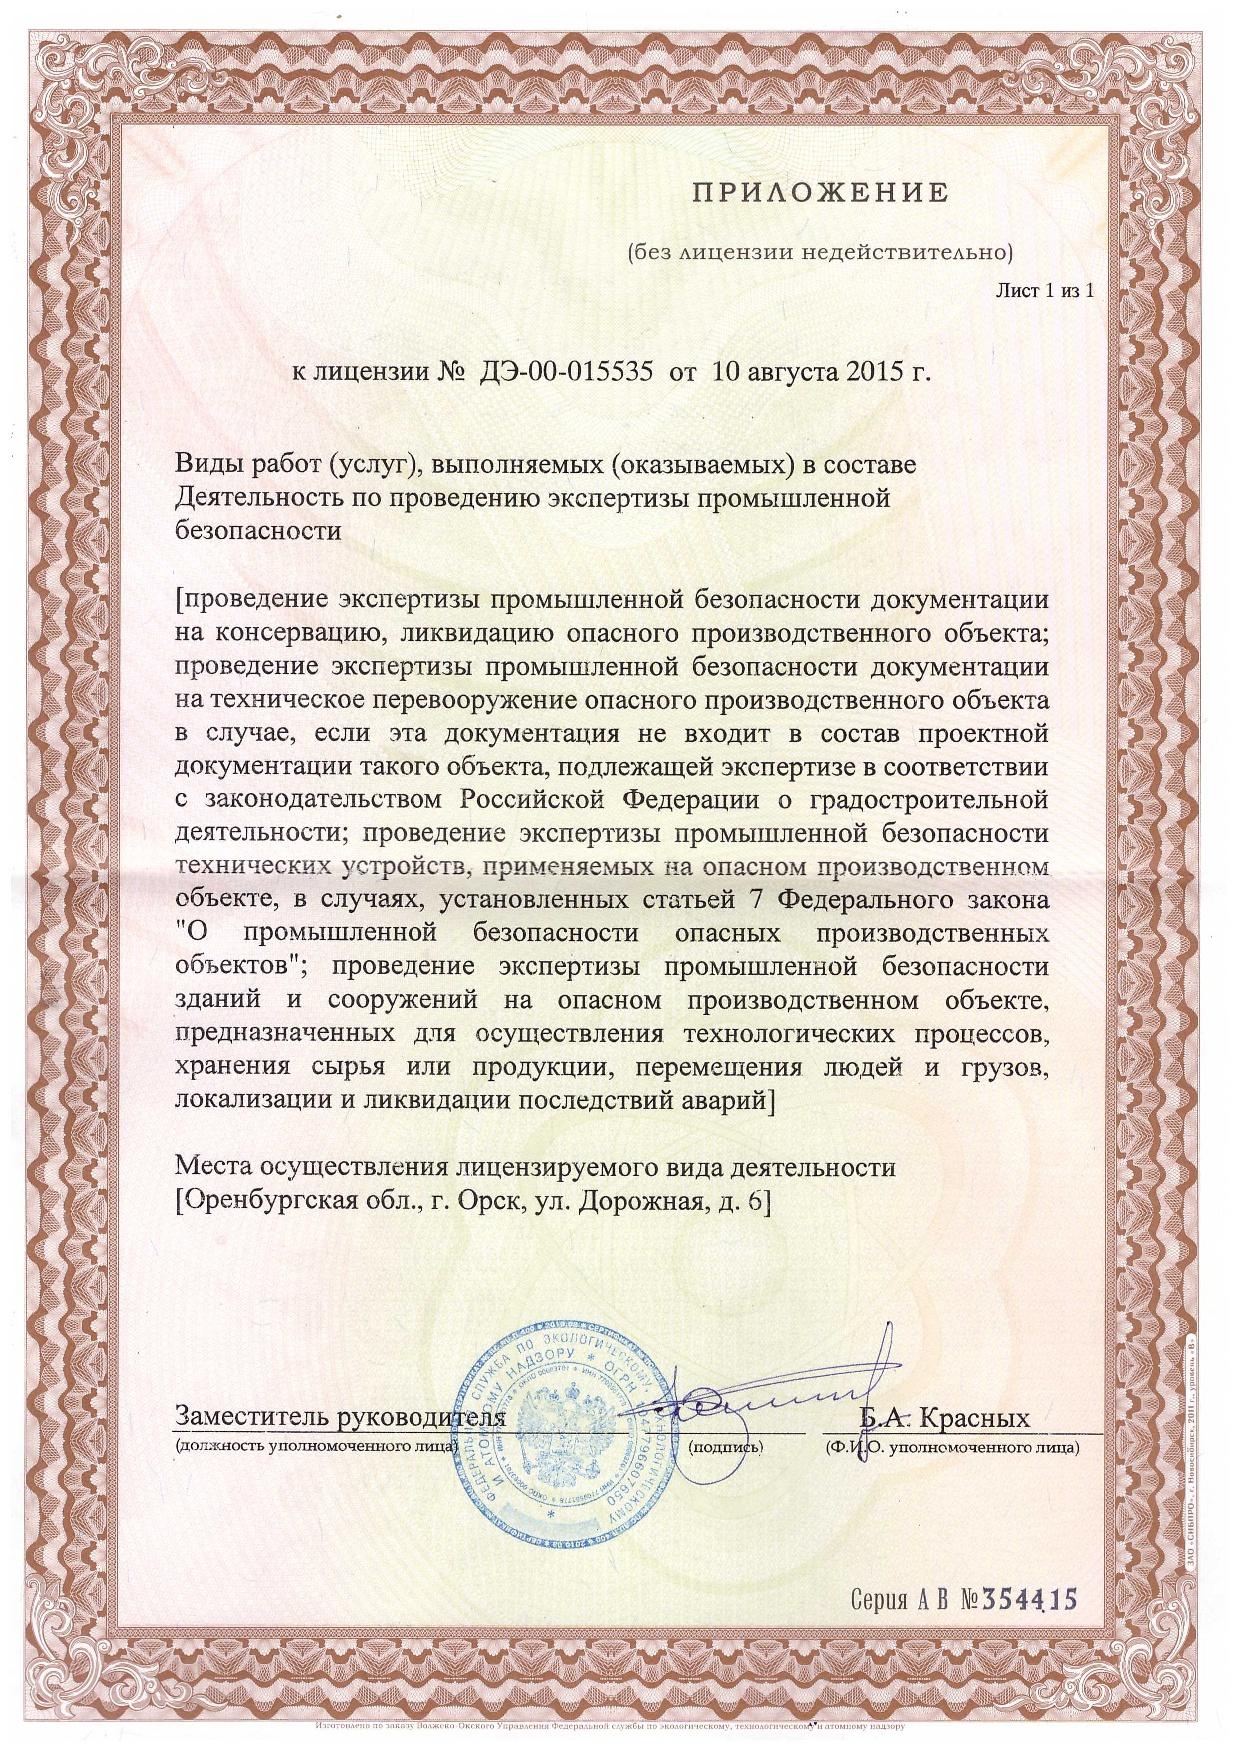 http://ivanov56.ru/img/035fa98762a3224ca53a5b1b51e61cac.jpg